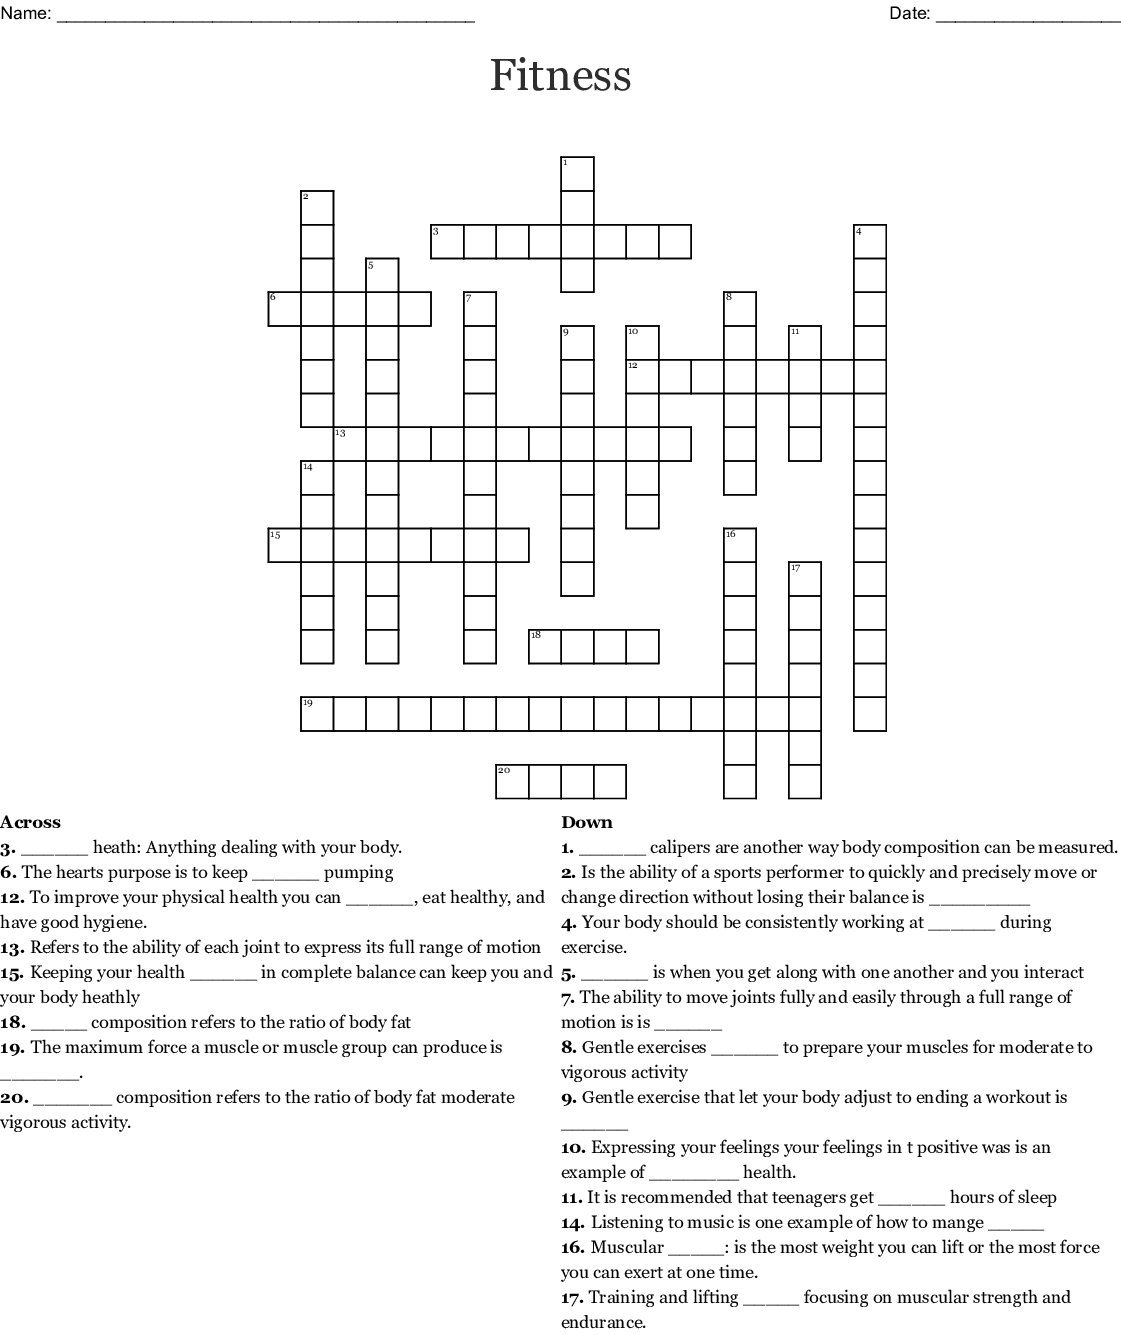 Fitness Crossword